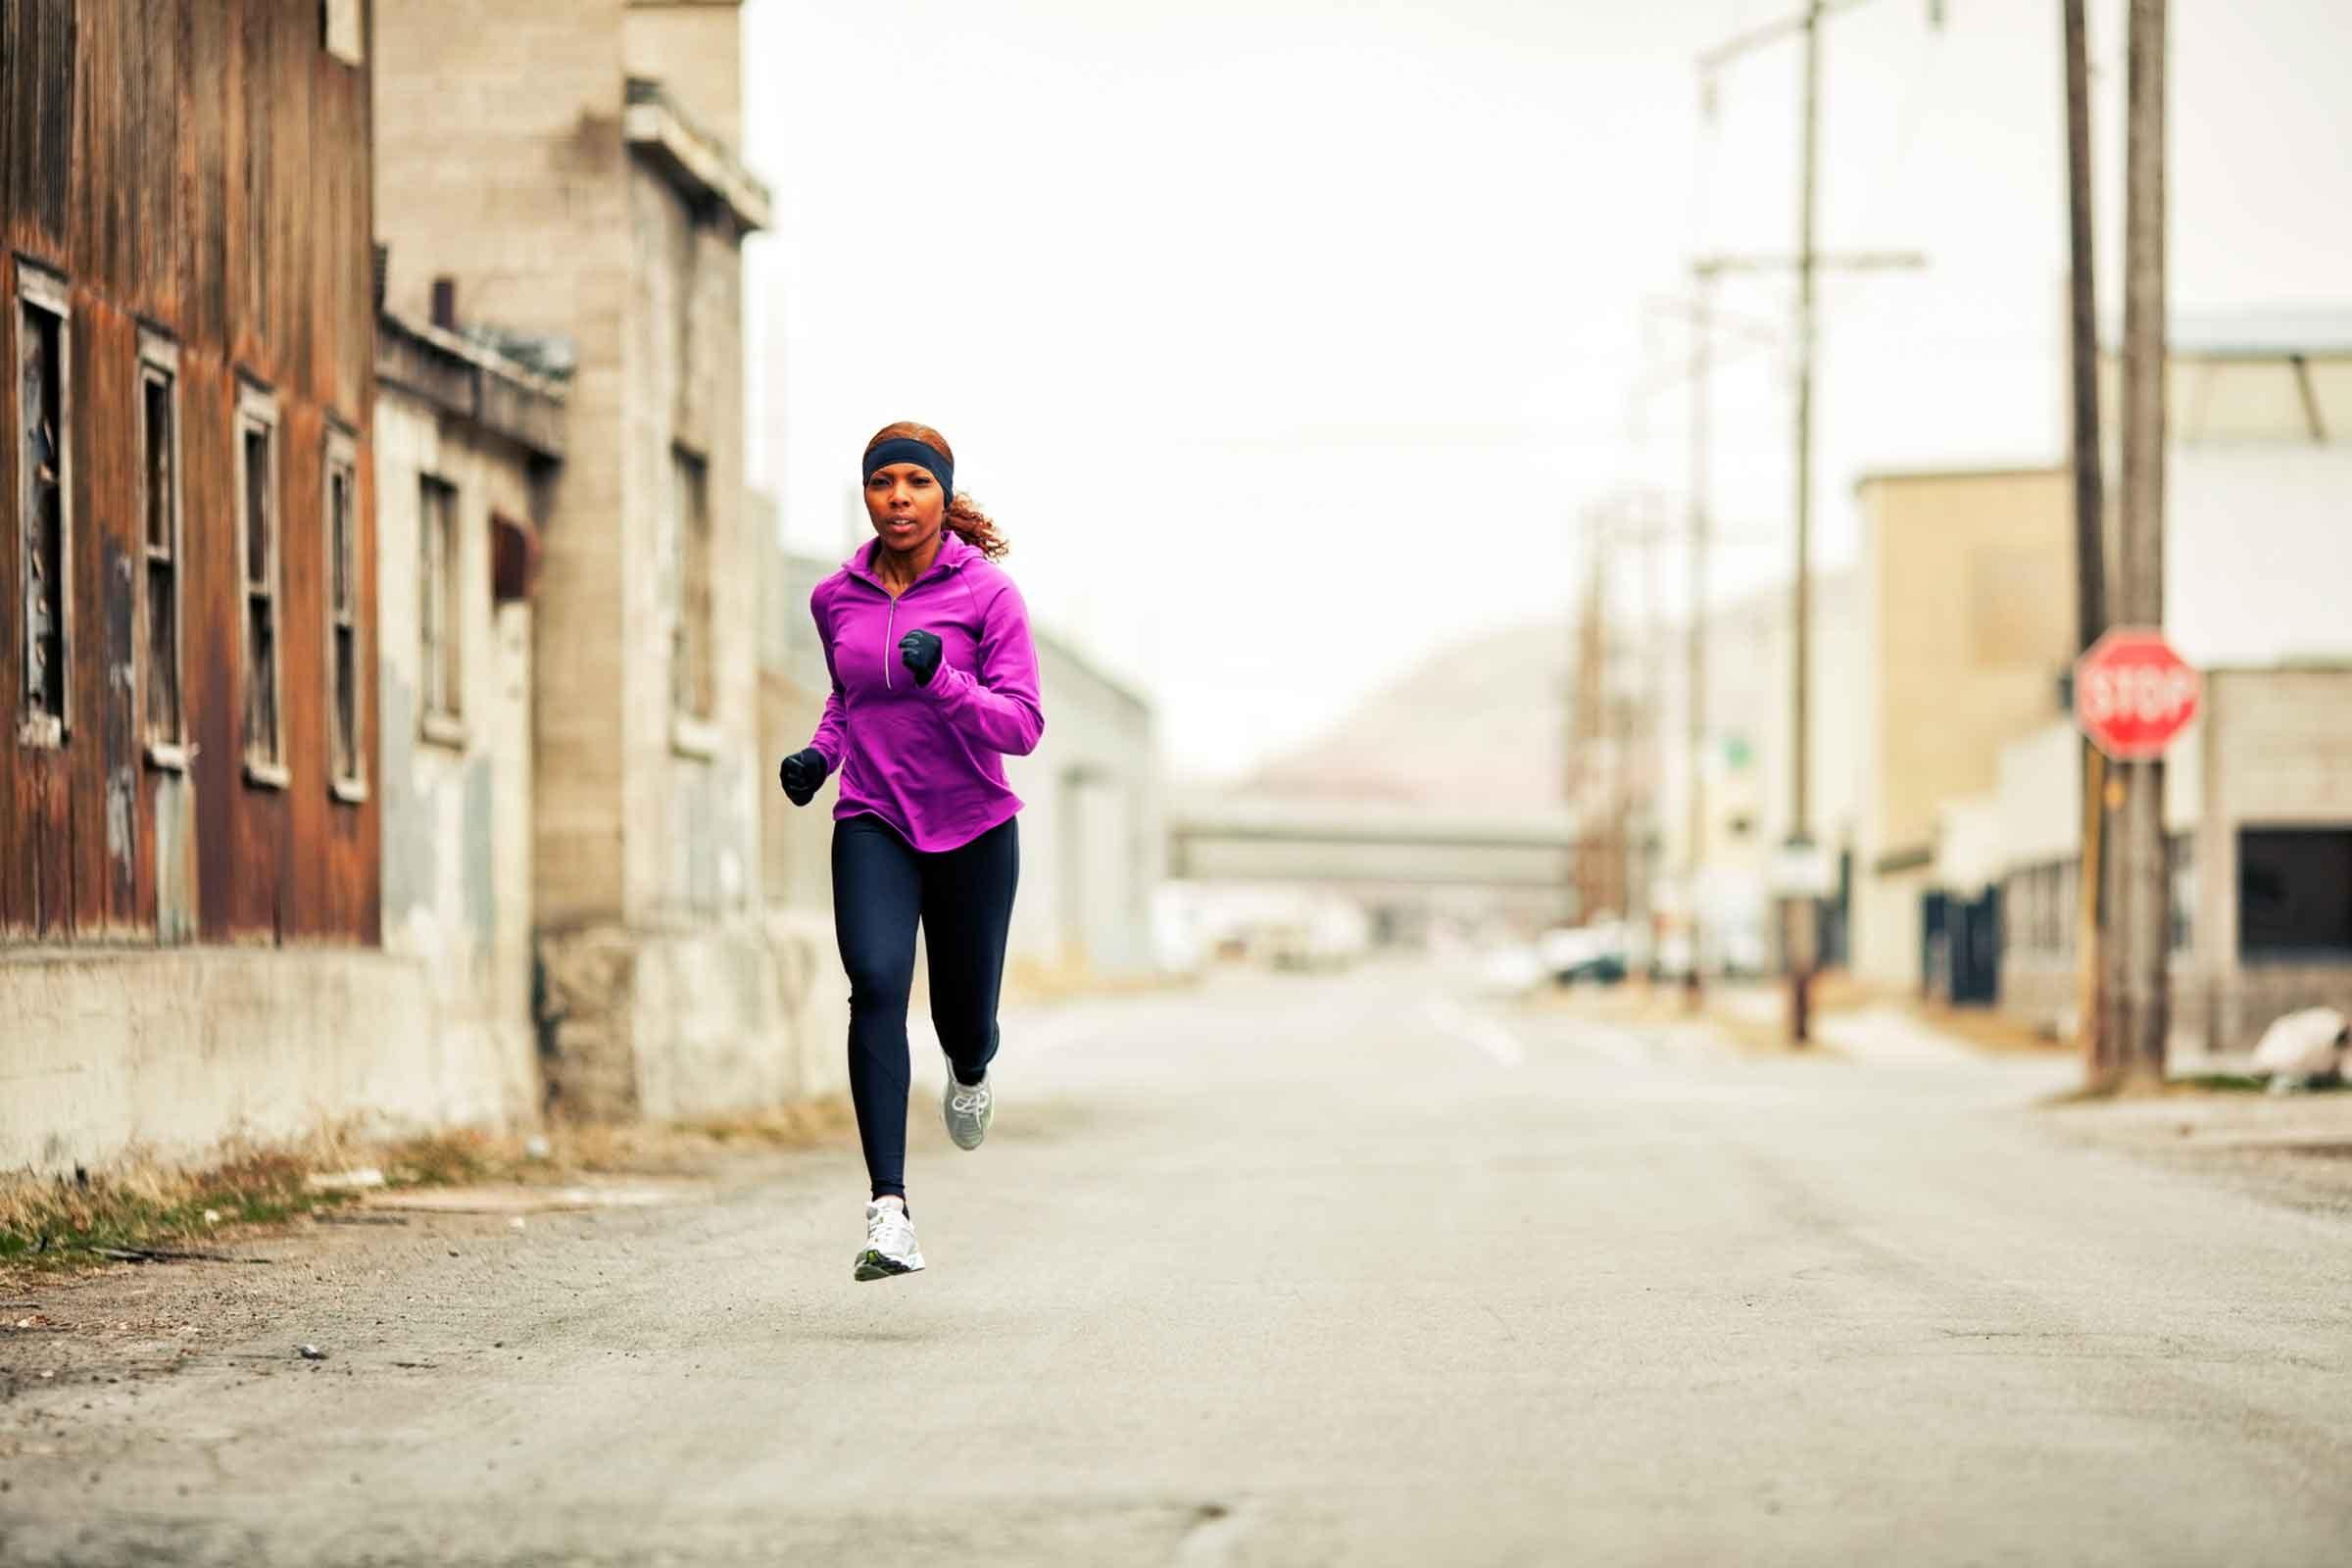 Make a fitness goal